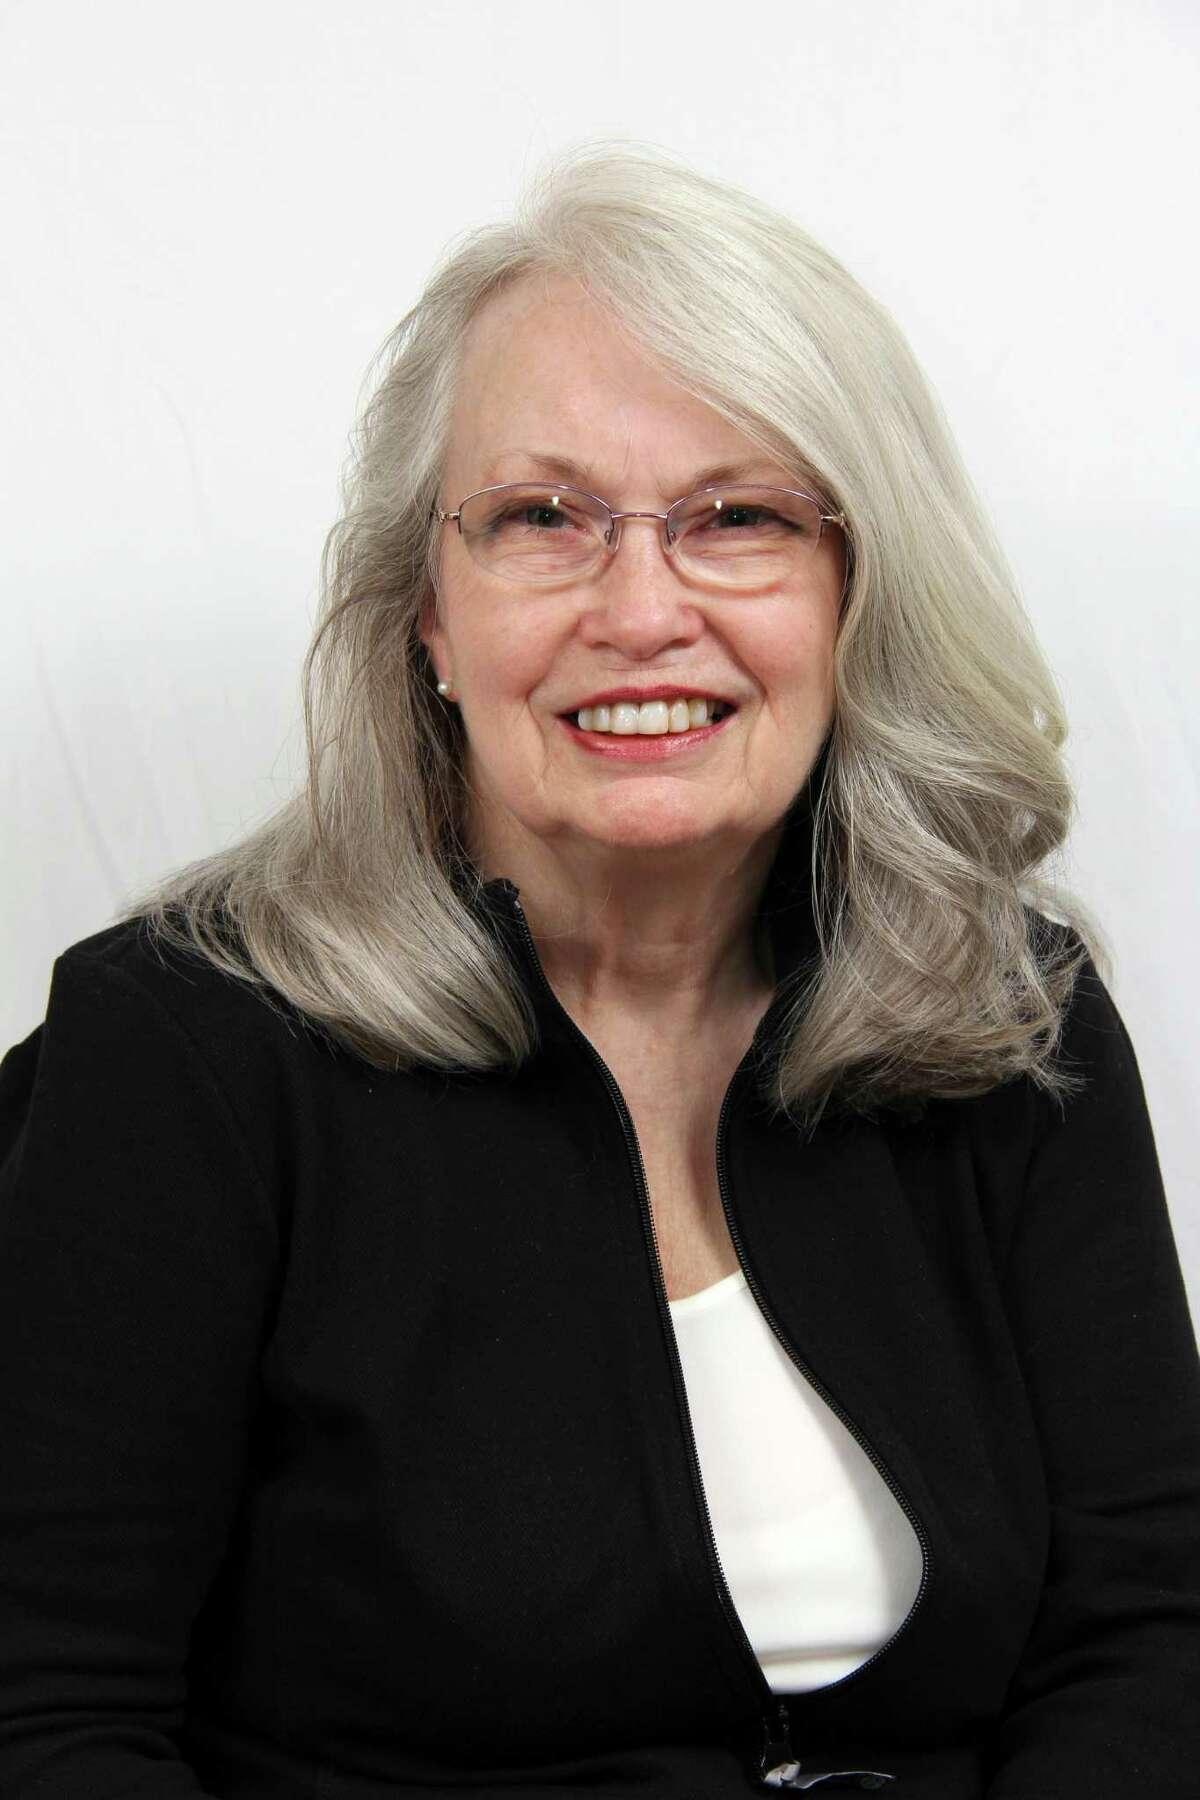 Bethel candidate Fern Blair Hart